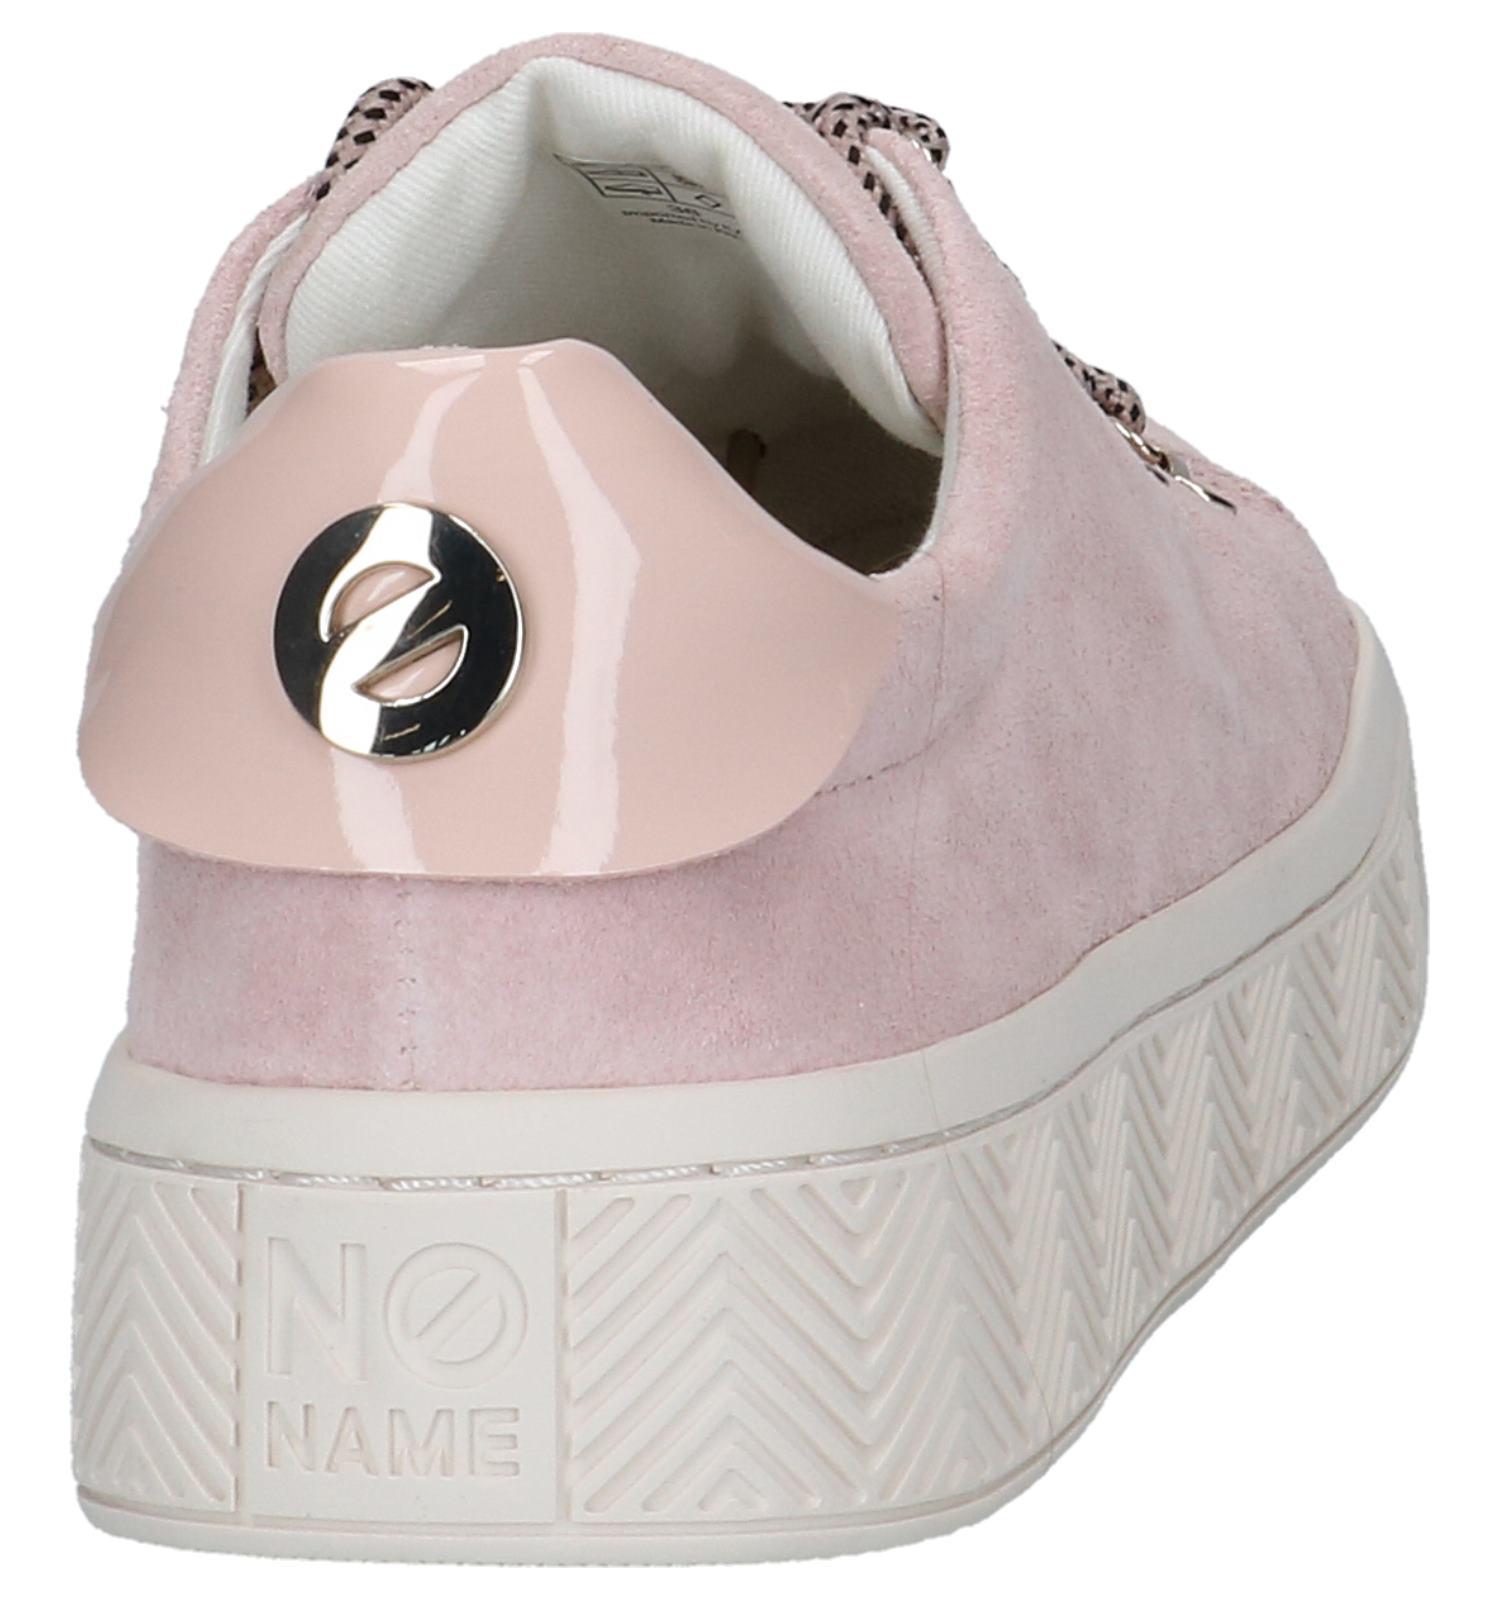 No Licht Sneakers Name Roze Ginger uTFK35Jl1c